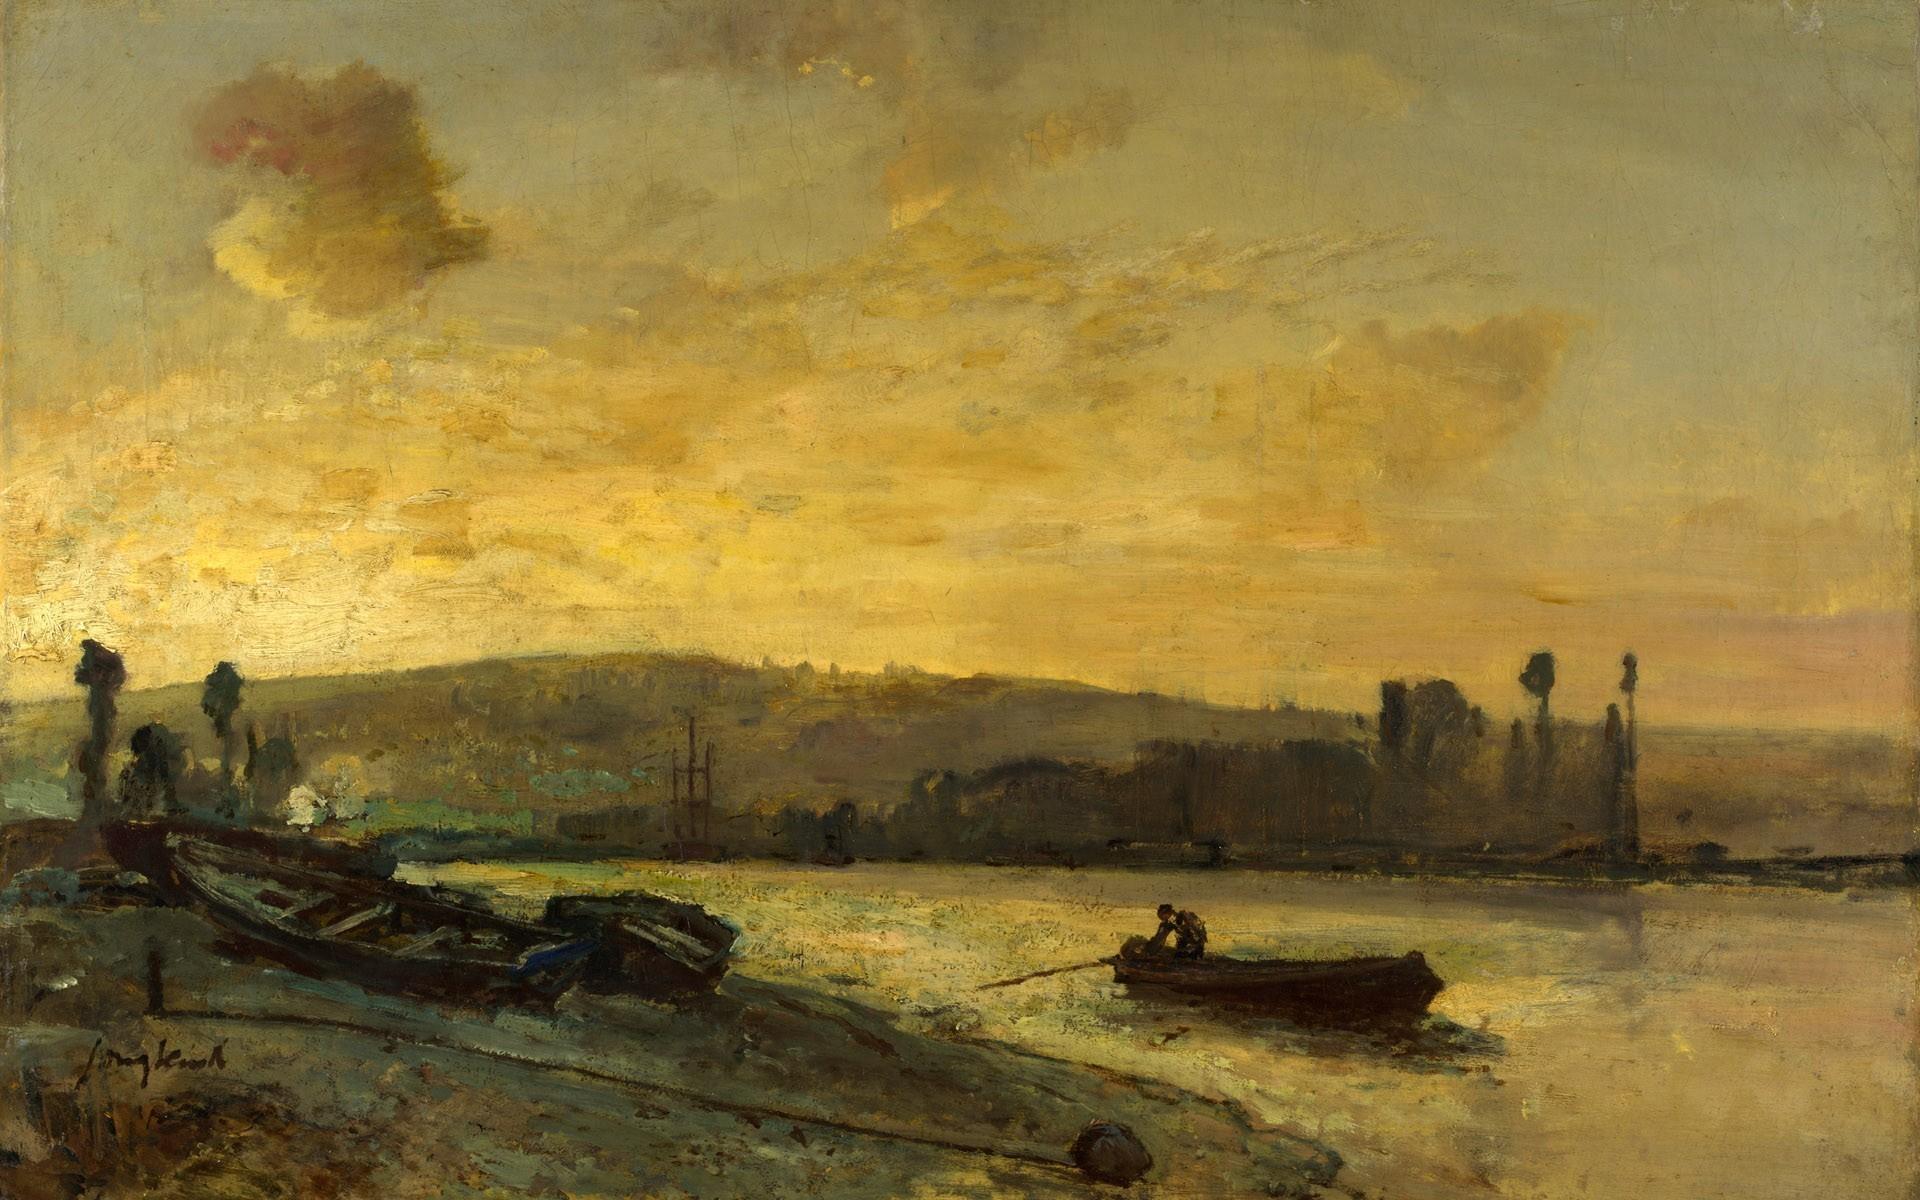 Boats paintings renaissance vehicles wallpaper